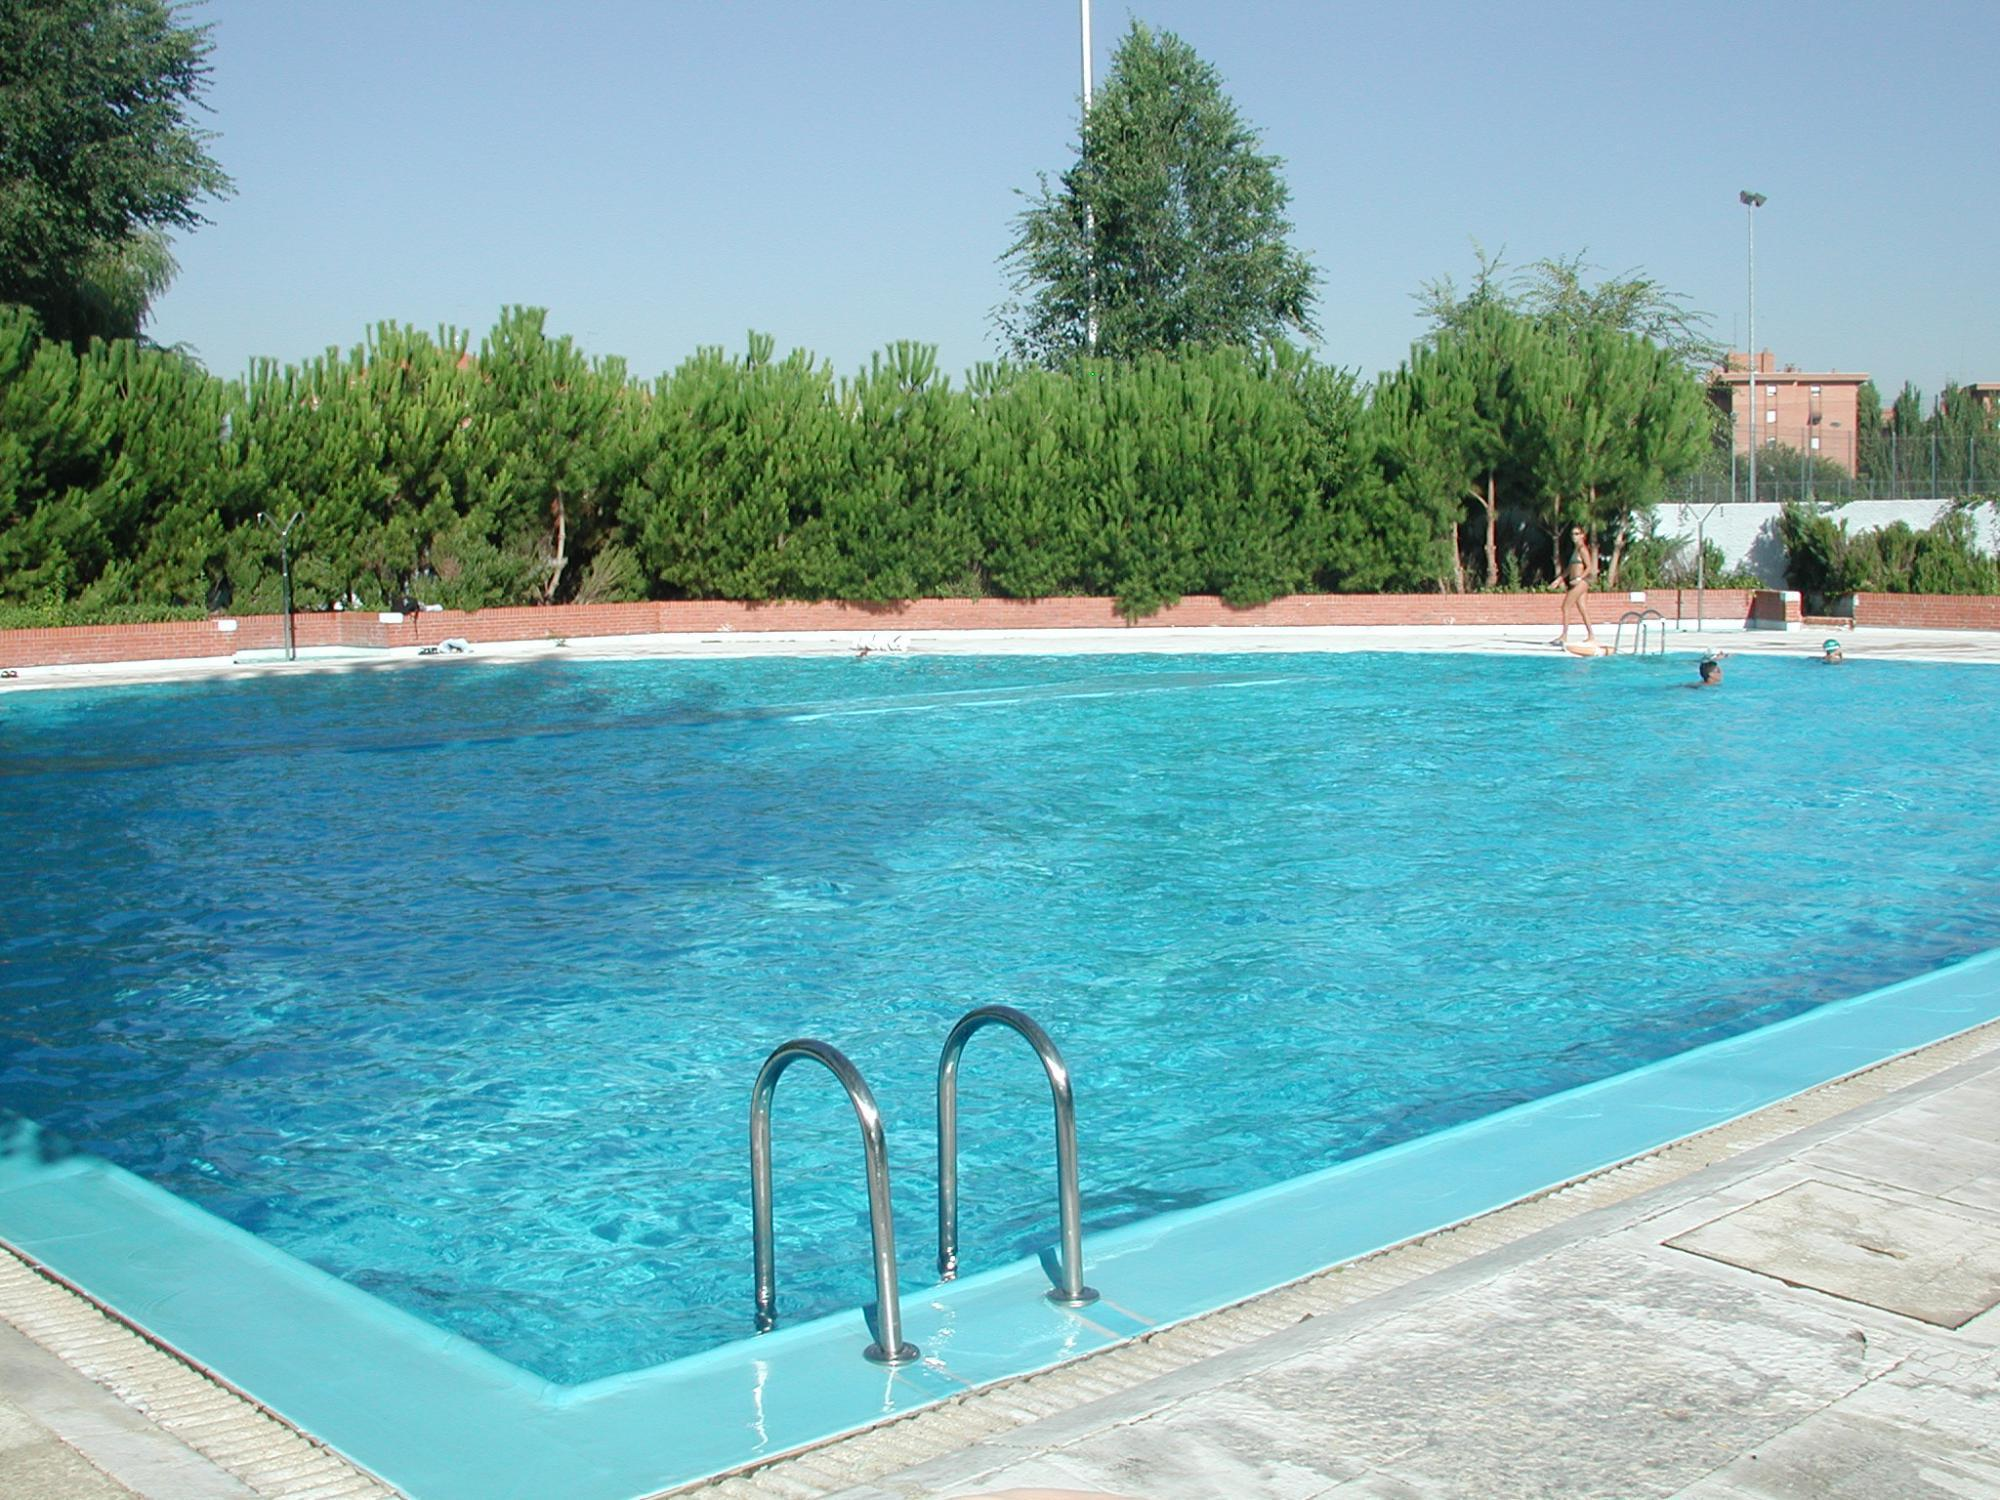 image gallery imagen de una piscina